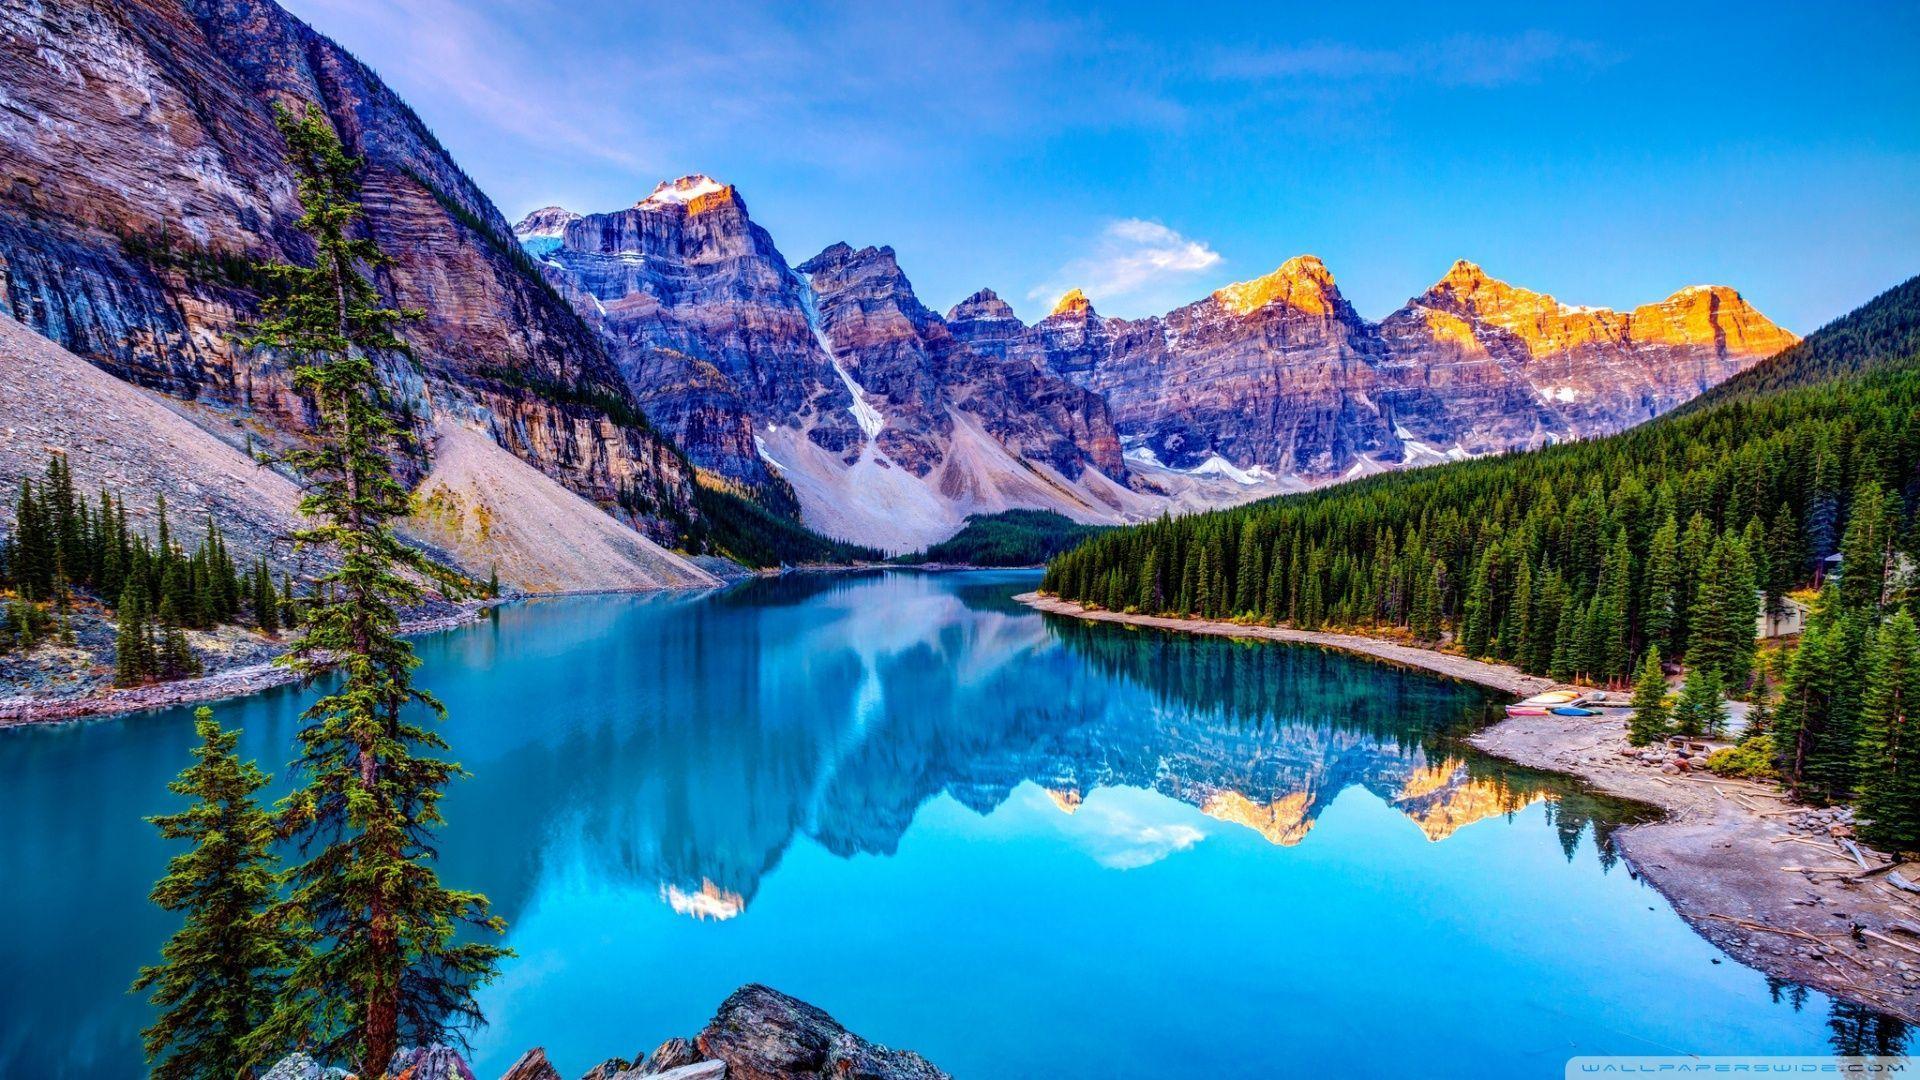 Desktop Wallpaper 4k Canada - Wallpaper